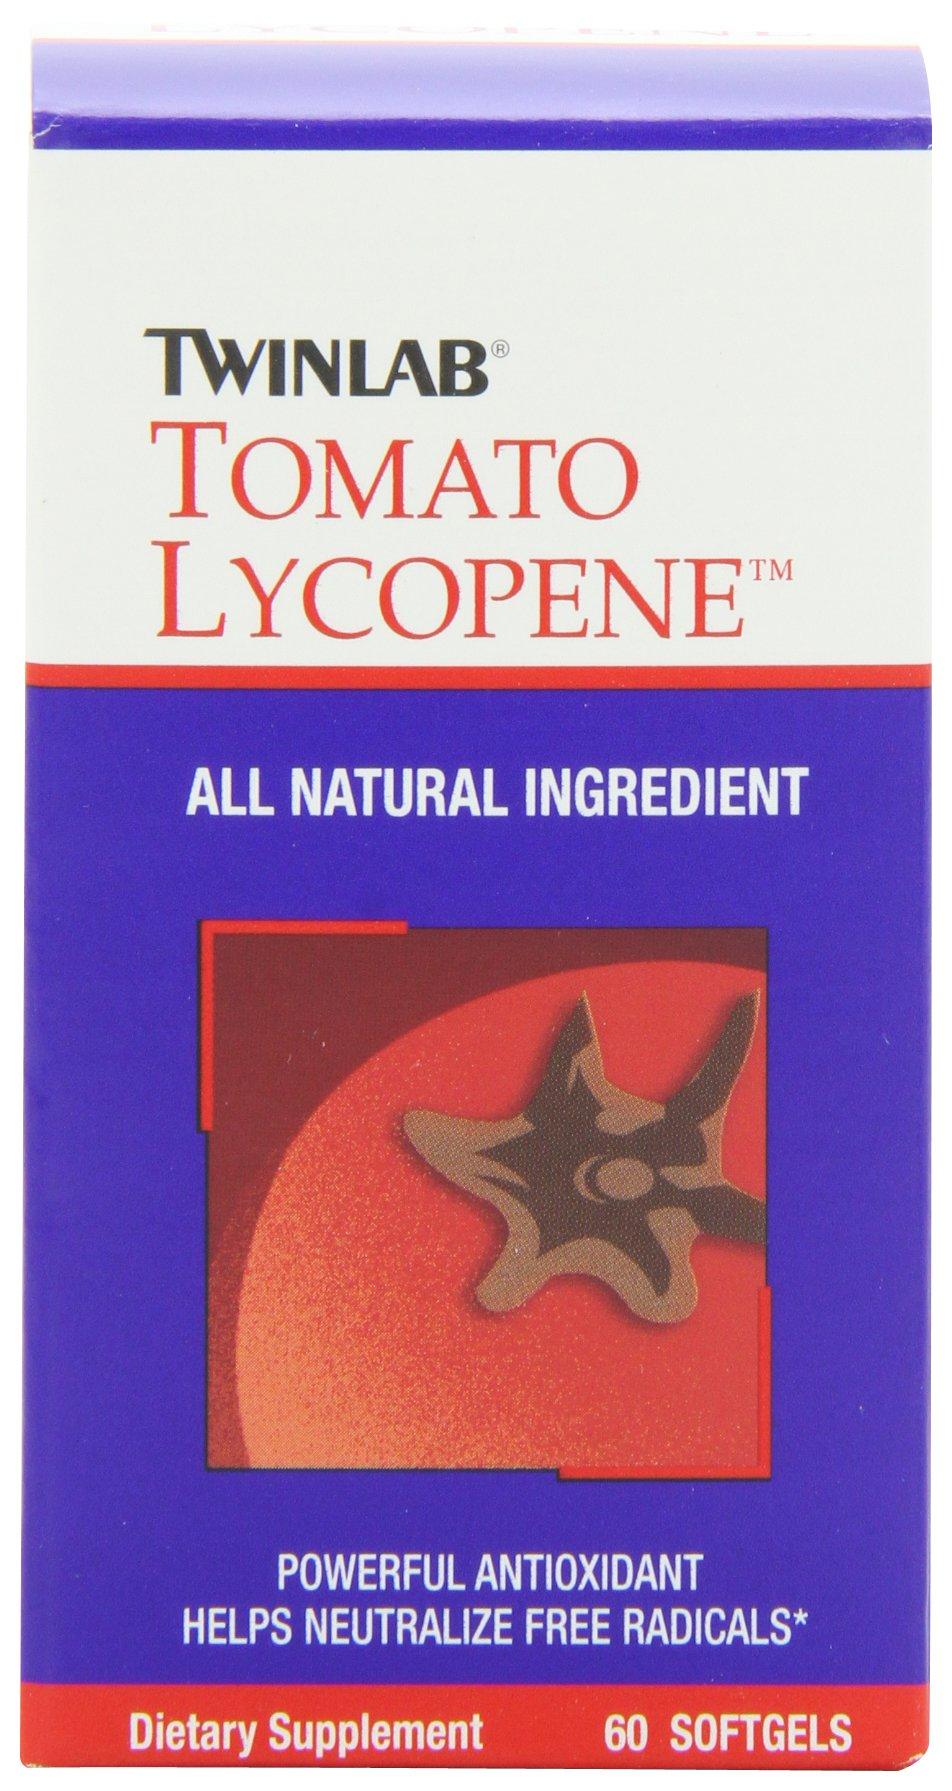 Twinlab Tomato Lycopene, 60 Softgels (Pack of 2)